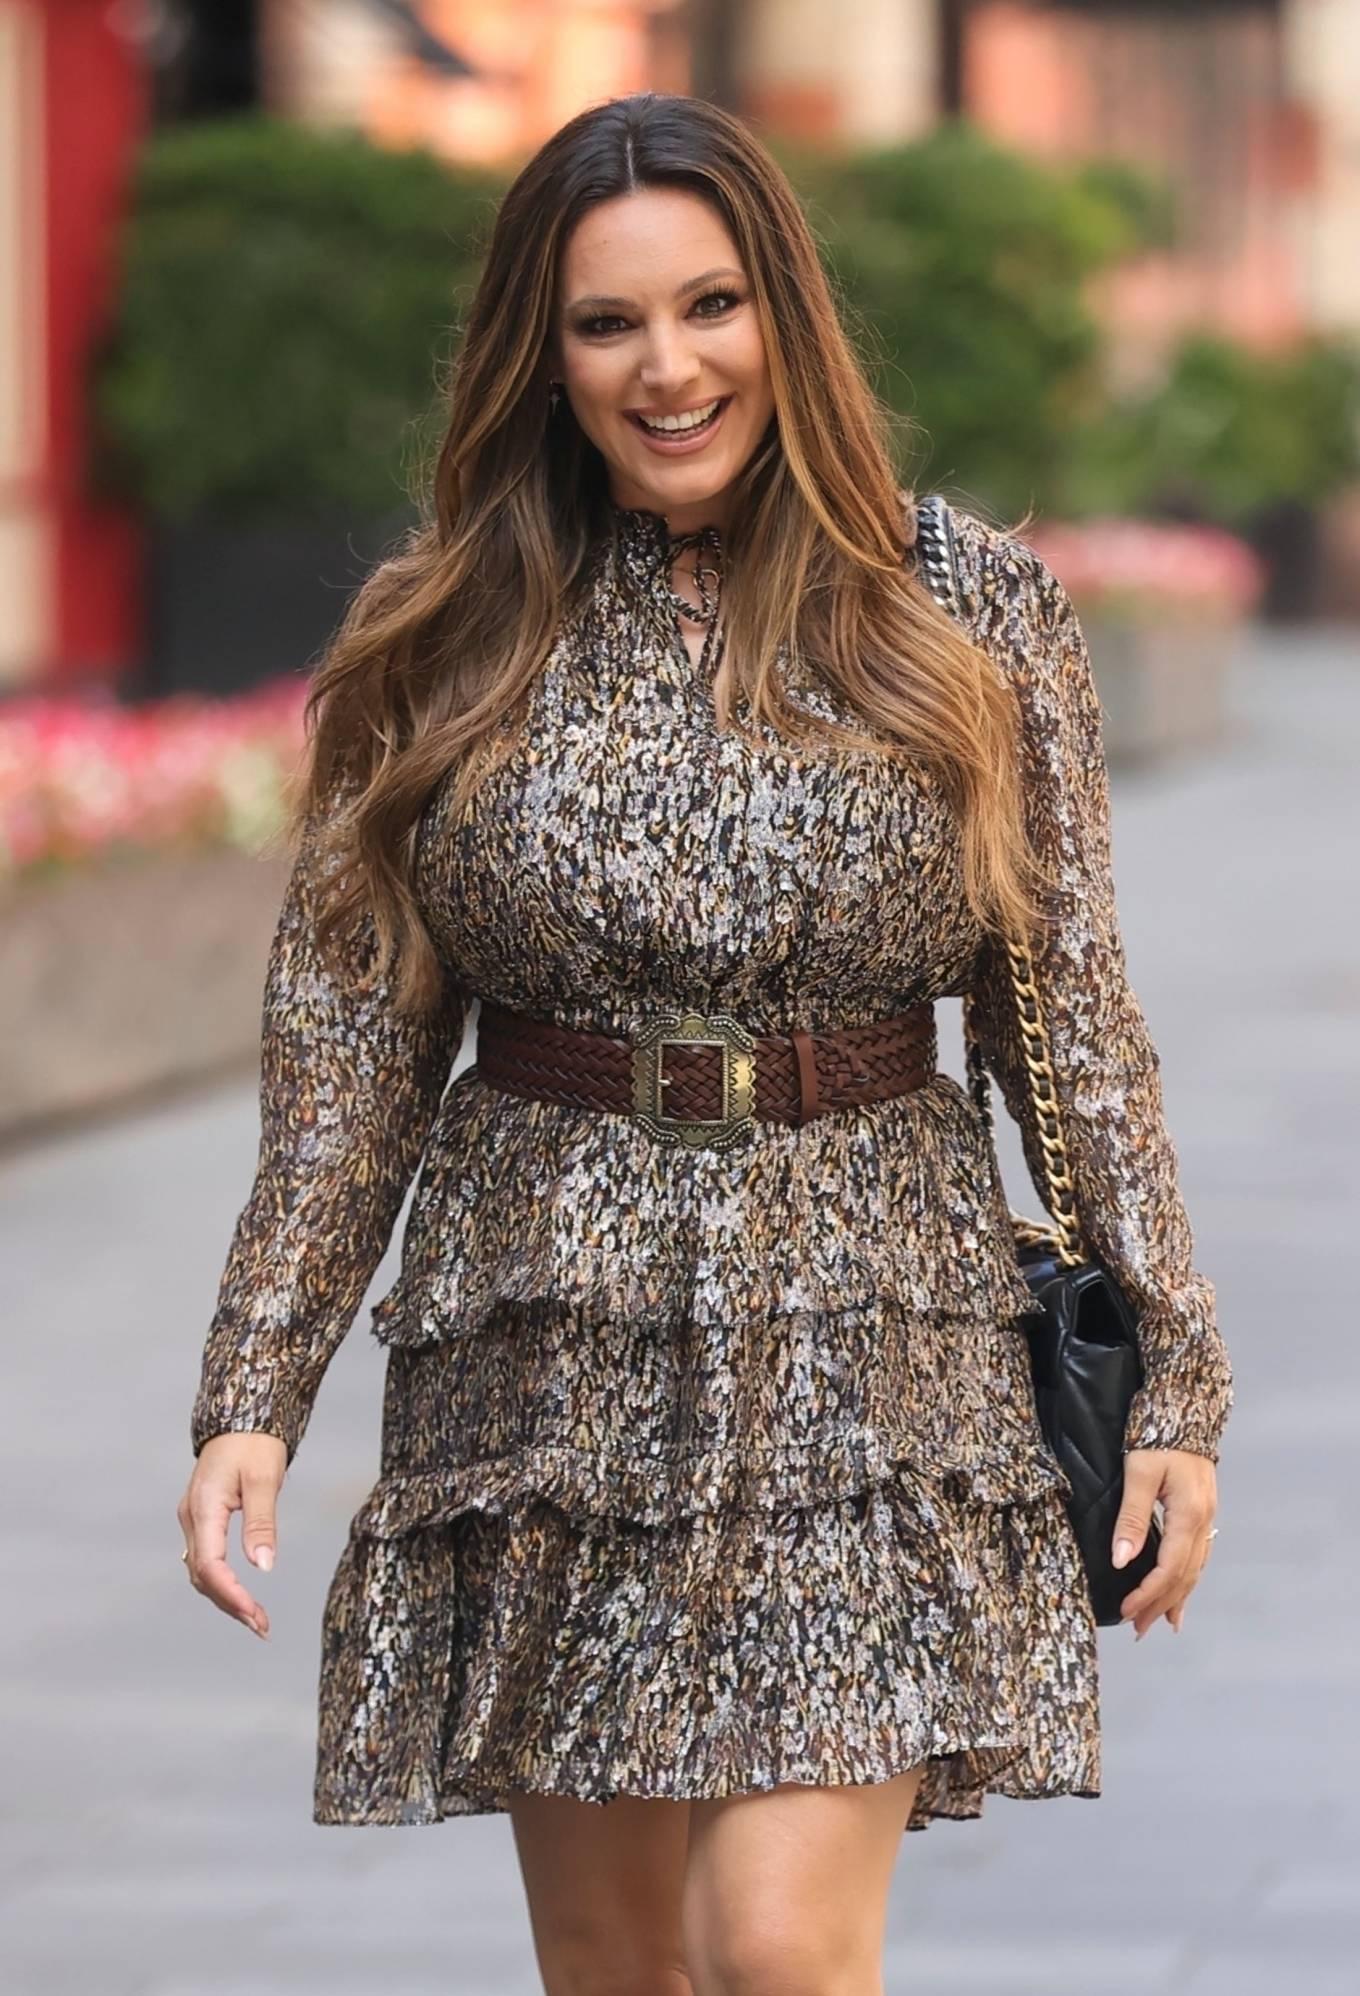 Kelly Brook - Wears sparkling metallic short dress at Heart radio in London